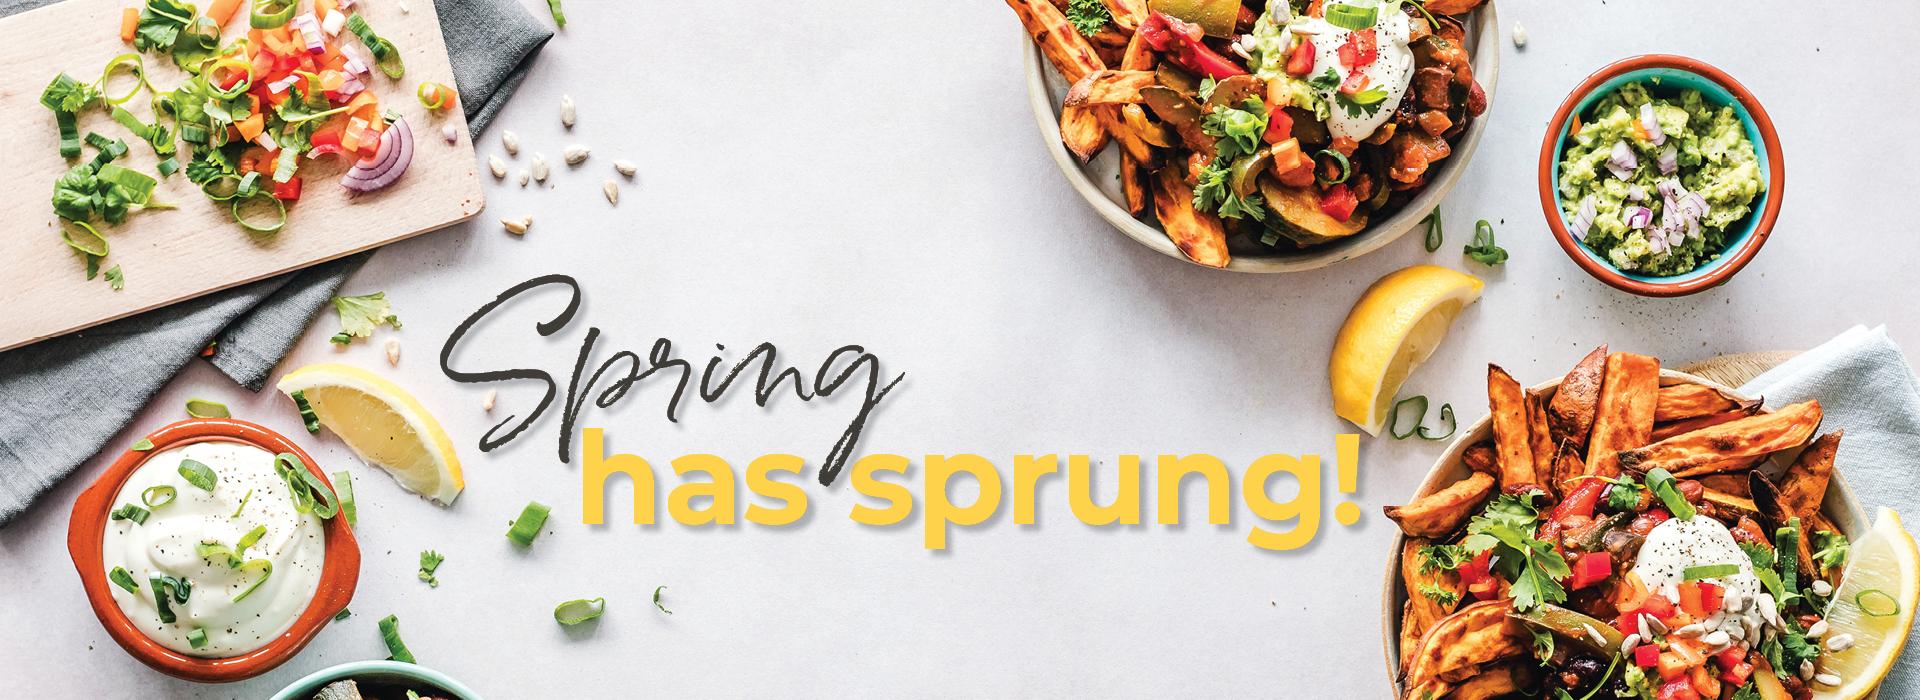 Hopper Retail Group Spring Has Sprung Web Banner 1920x700